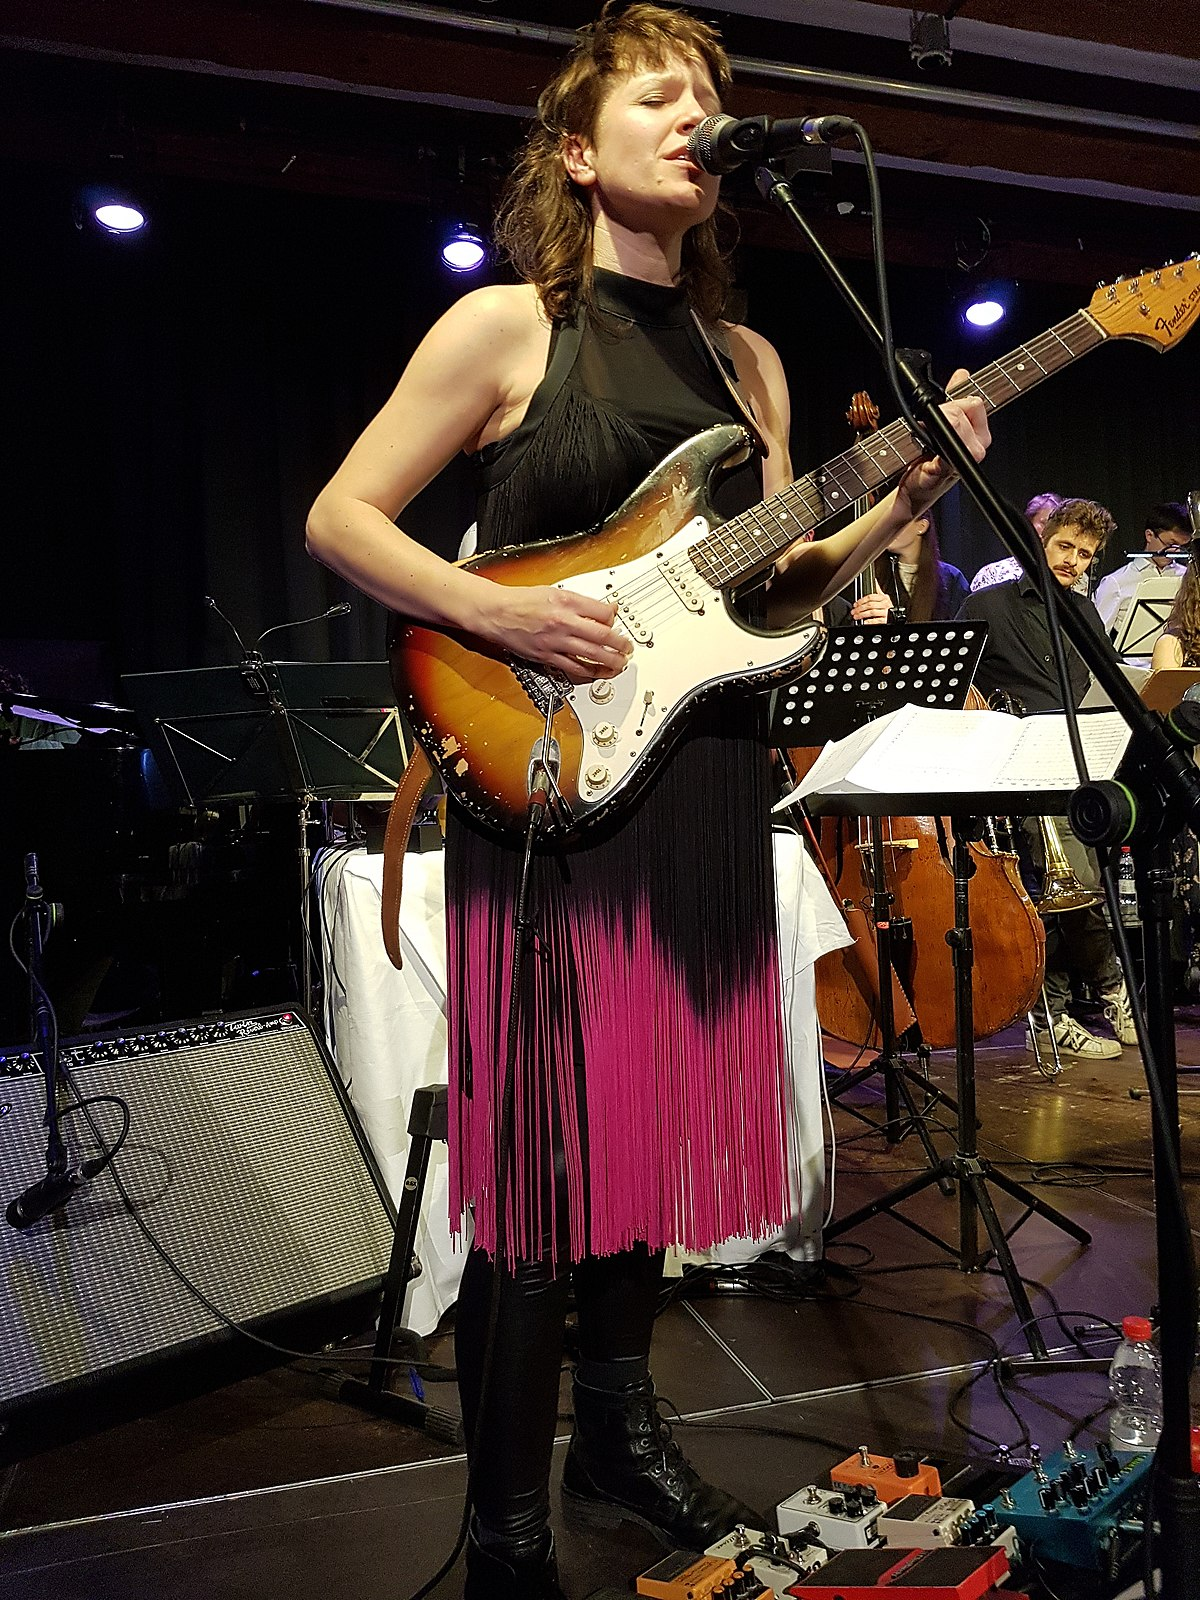 Enja Sängerin